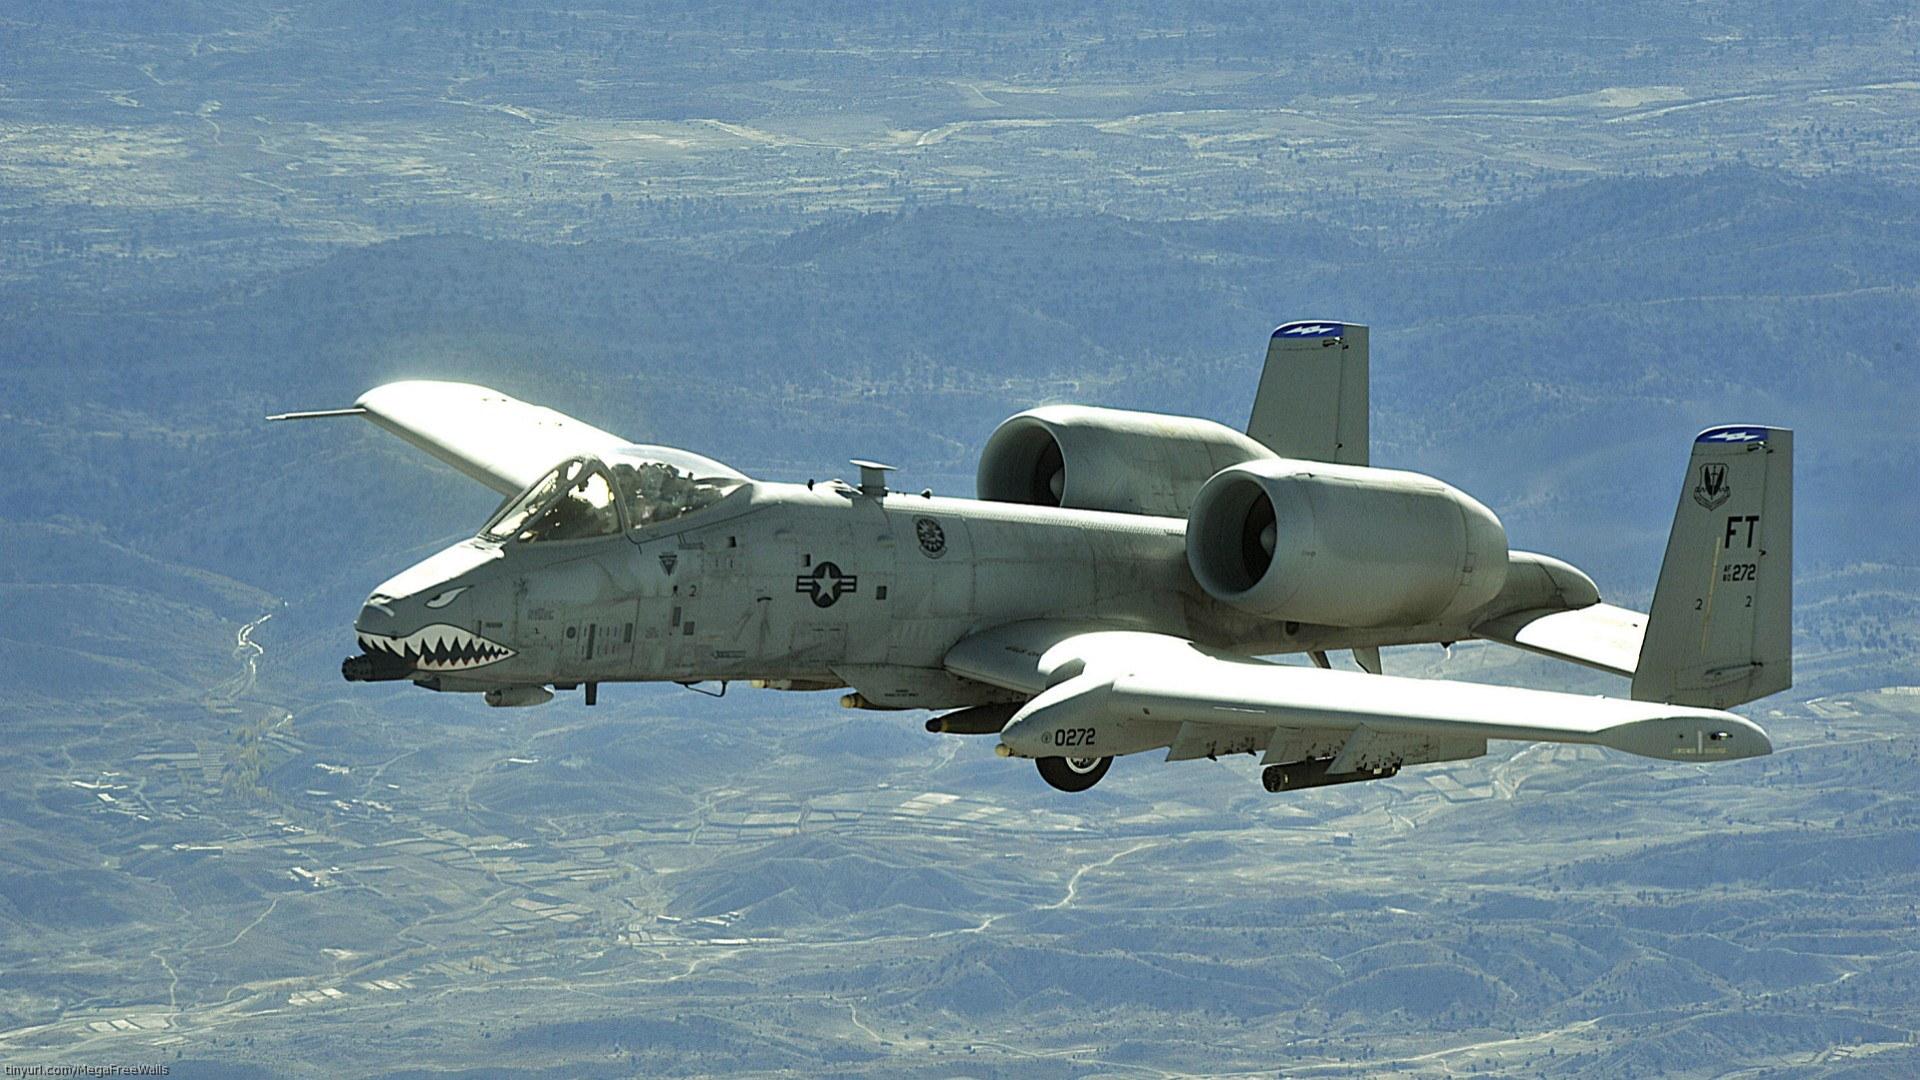 Fairchild Republic A-10 Thunderbolt II Full HD Wallpaper ...